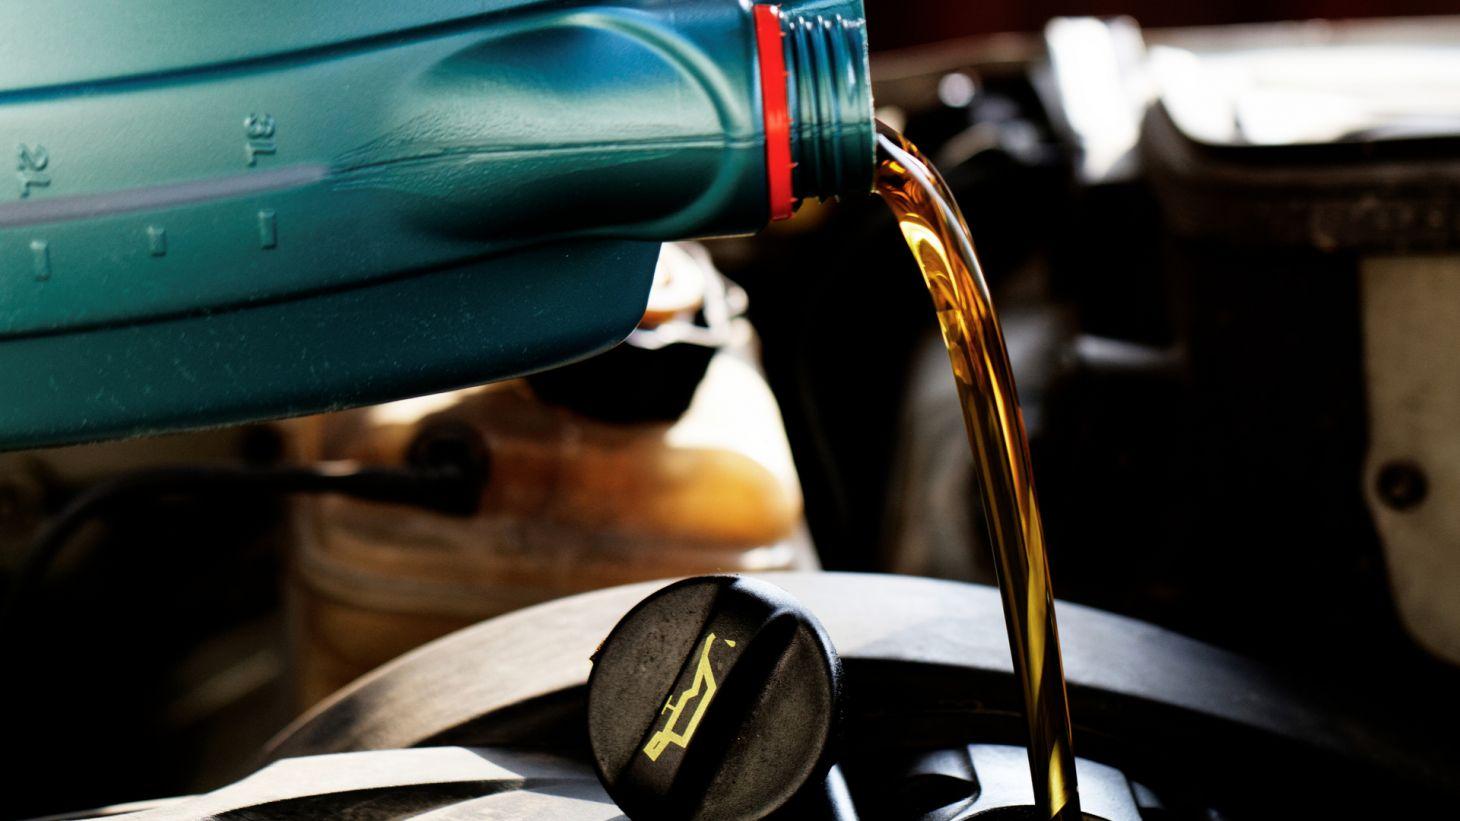 embalagem oleo motor carro troca tampa reservatorio fluido